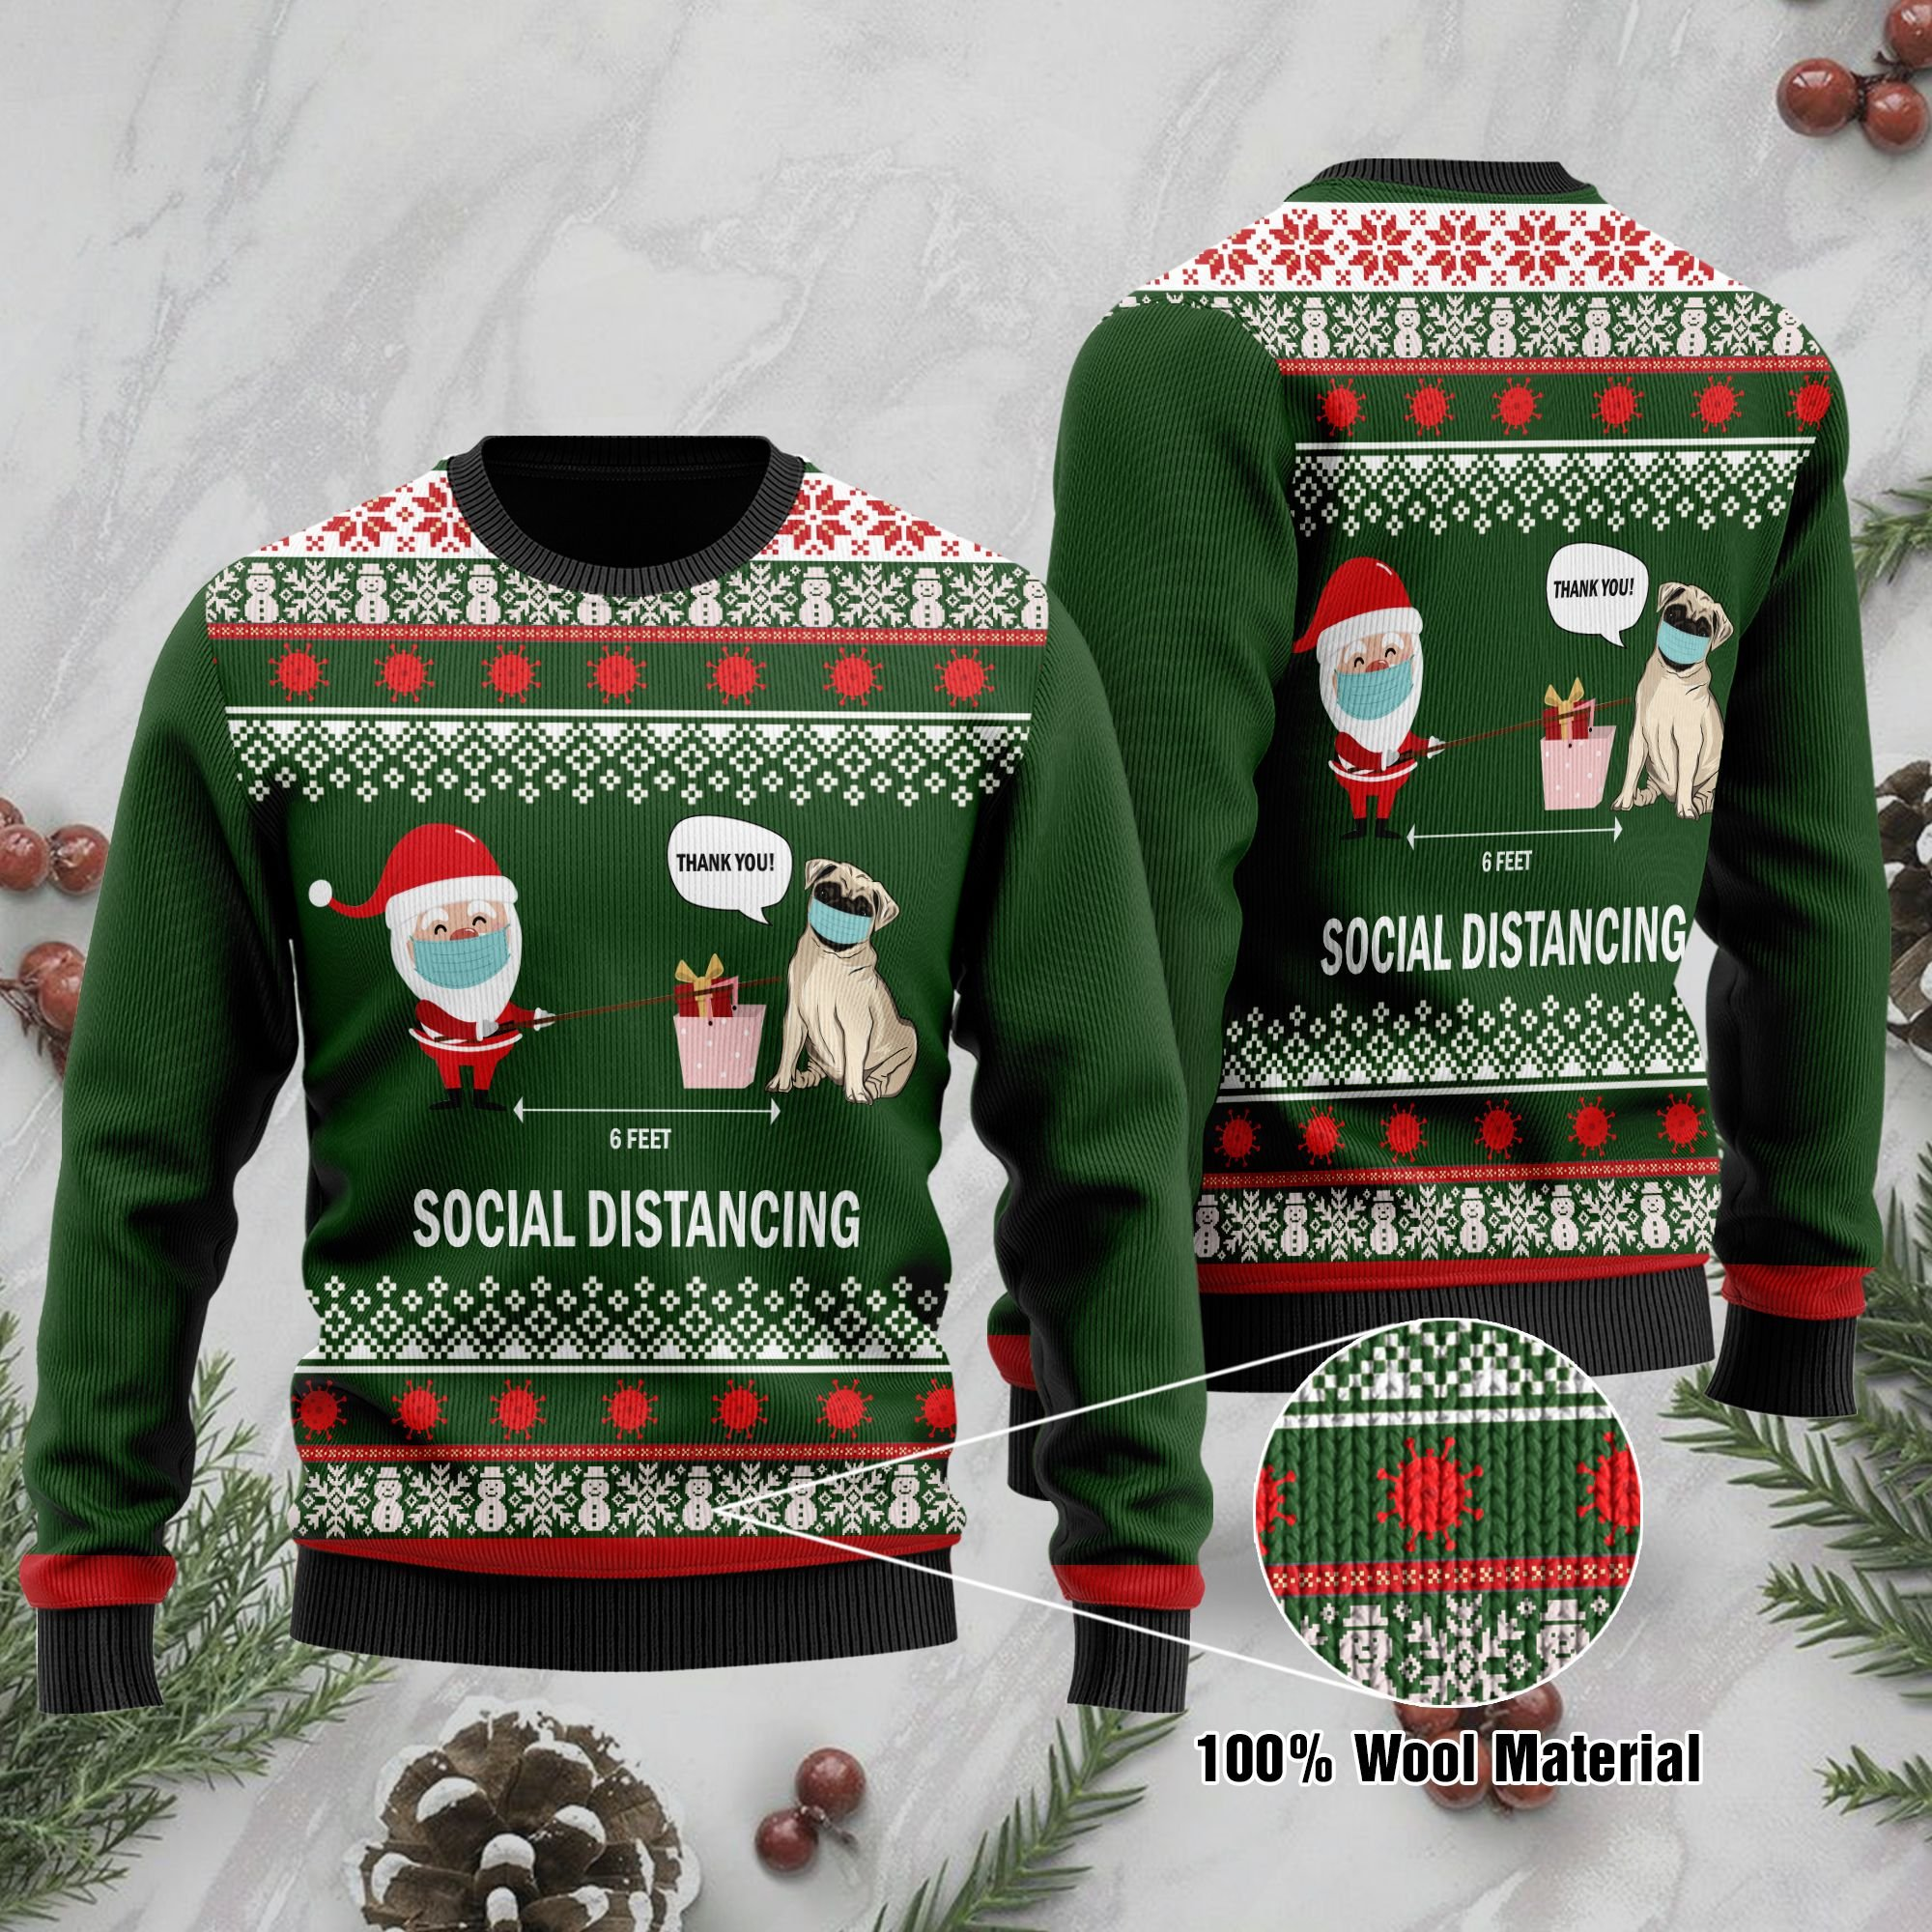 6 Feet Social Distancing Pug And Santa Claus Ugly Sweater